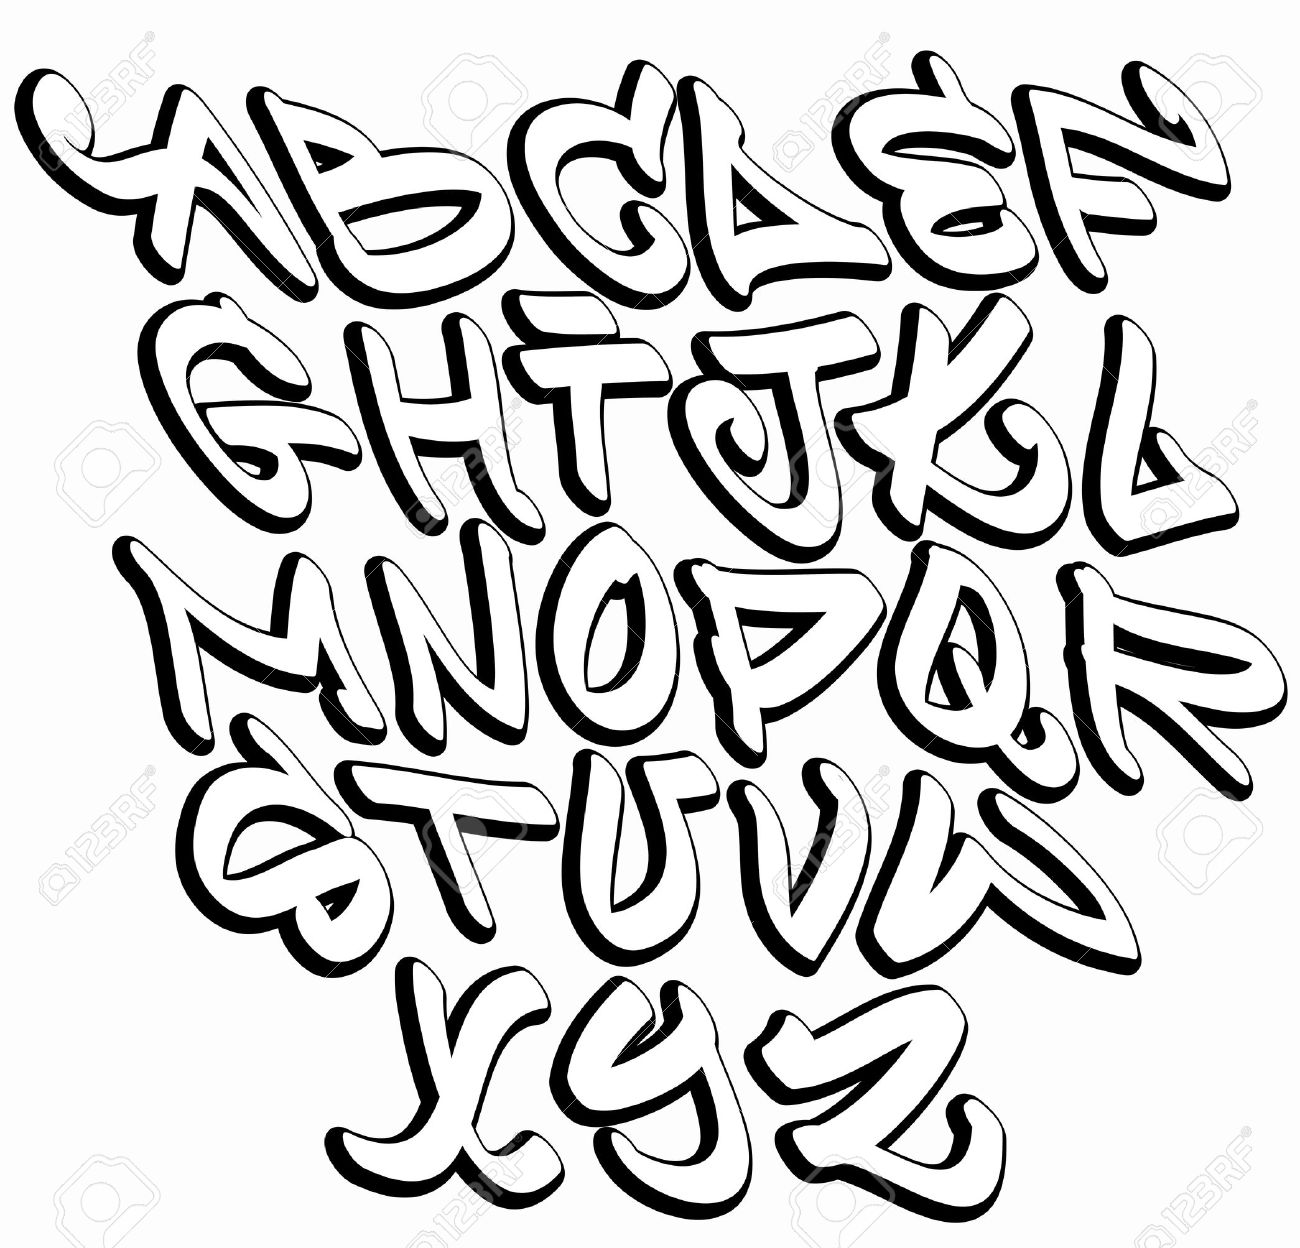 1300x1248 Graffiti Font Alphabet Letters. Hip Hop Type Grafitti Design